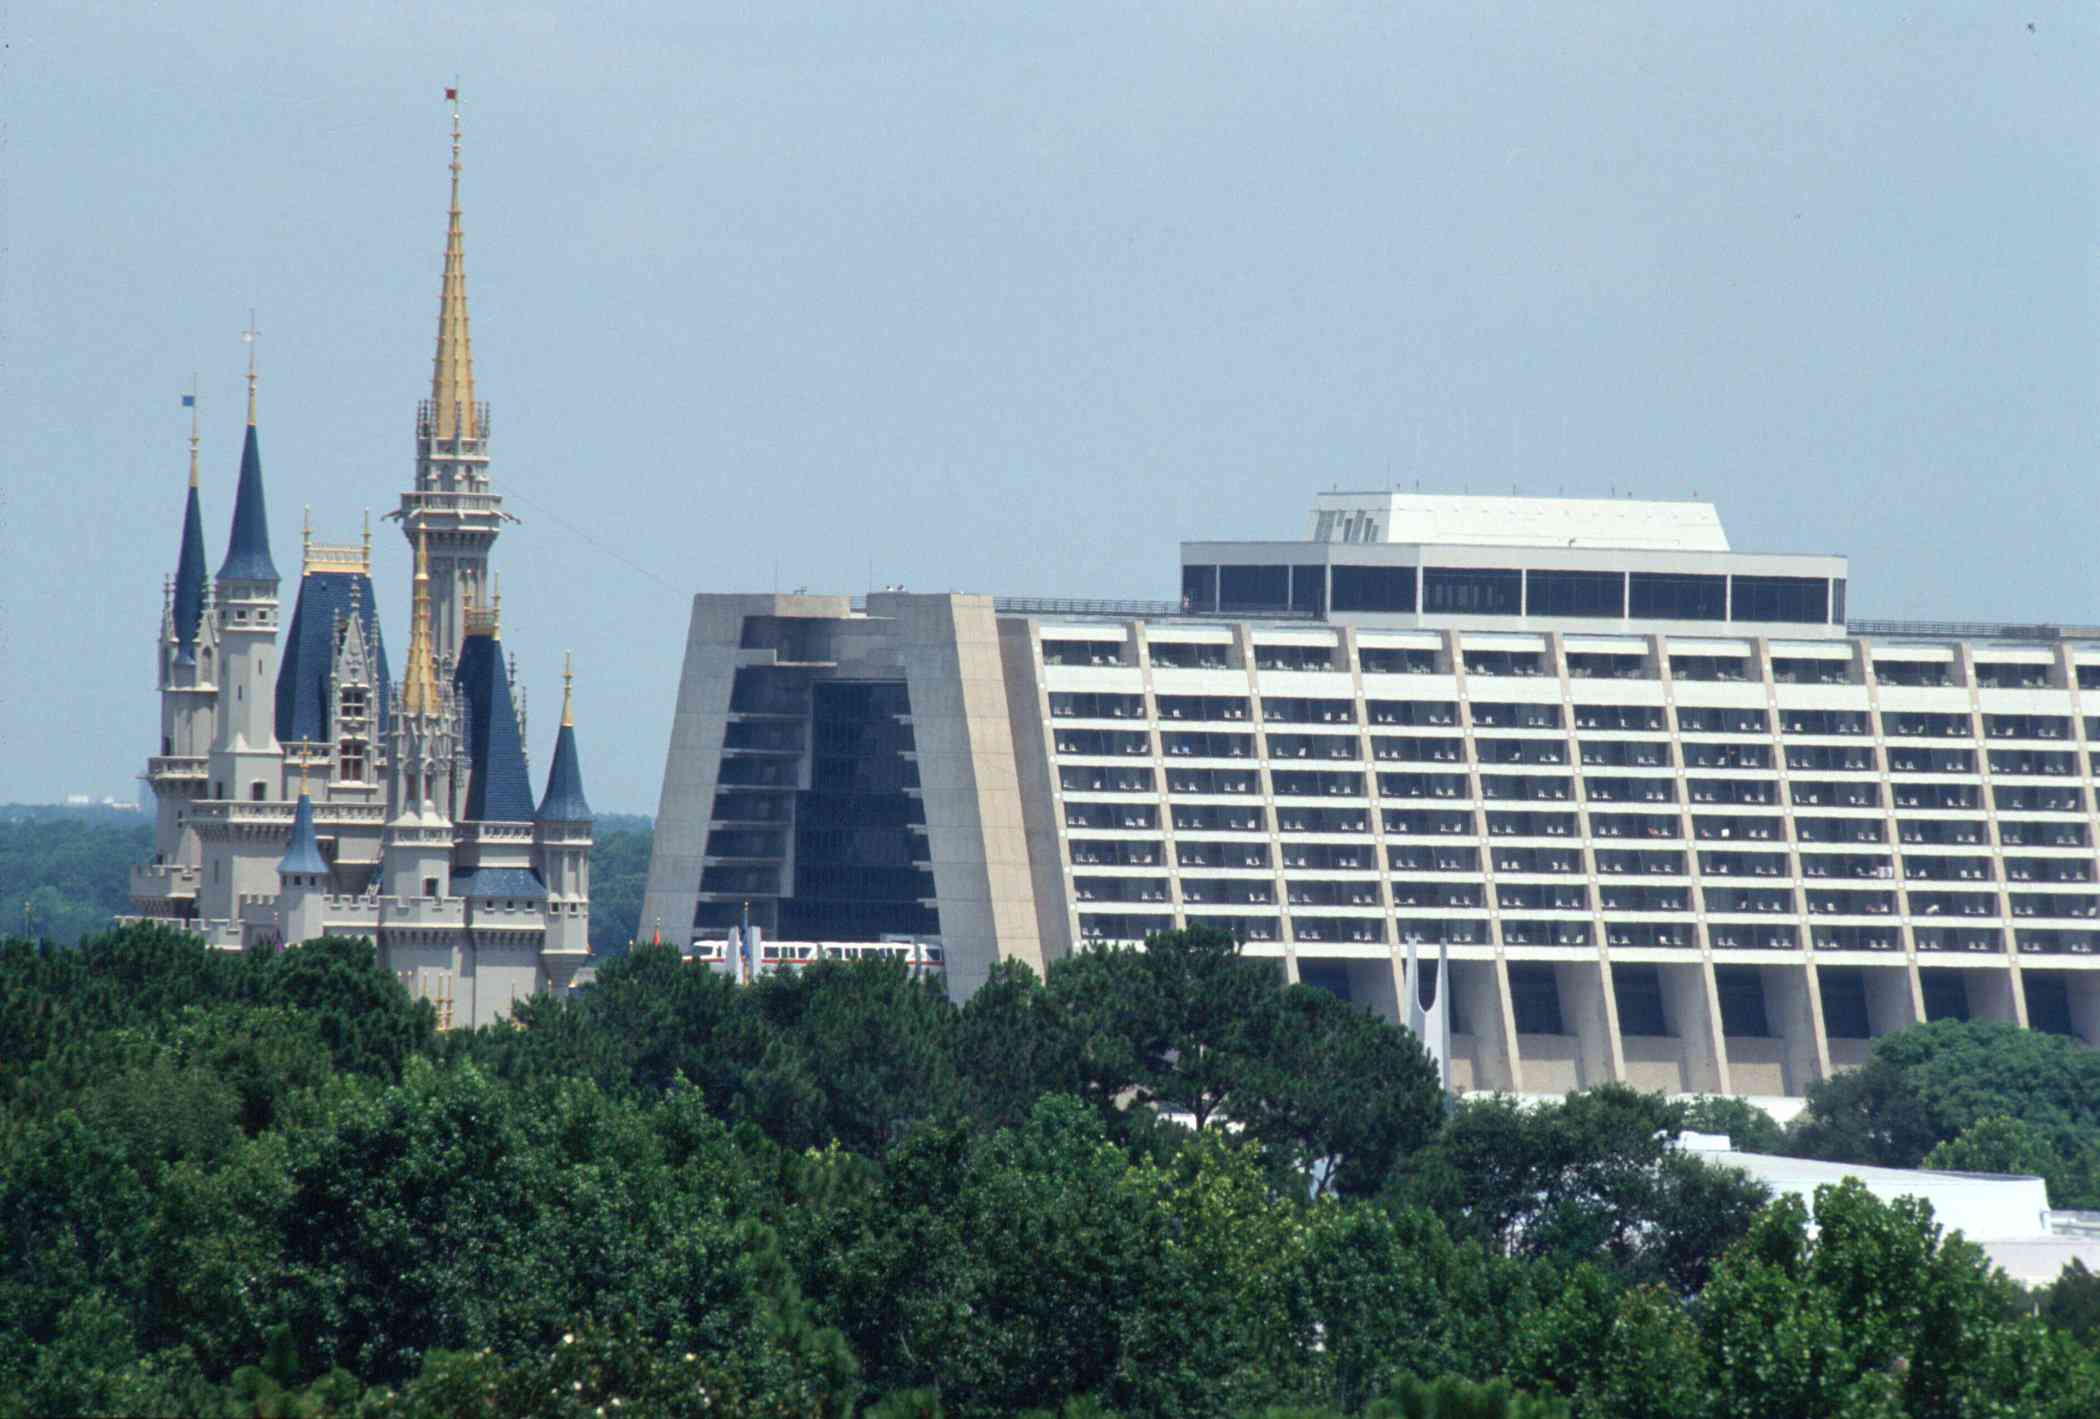 Contemporary Hotel at Disney World